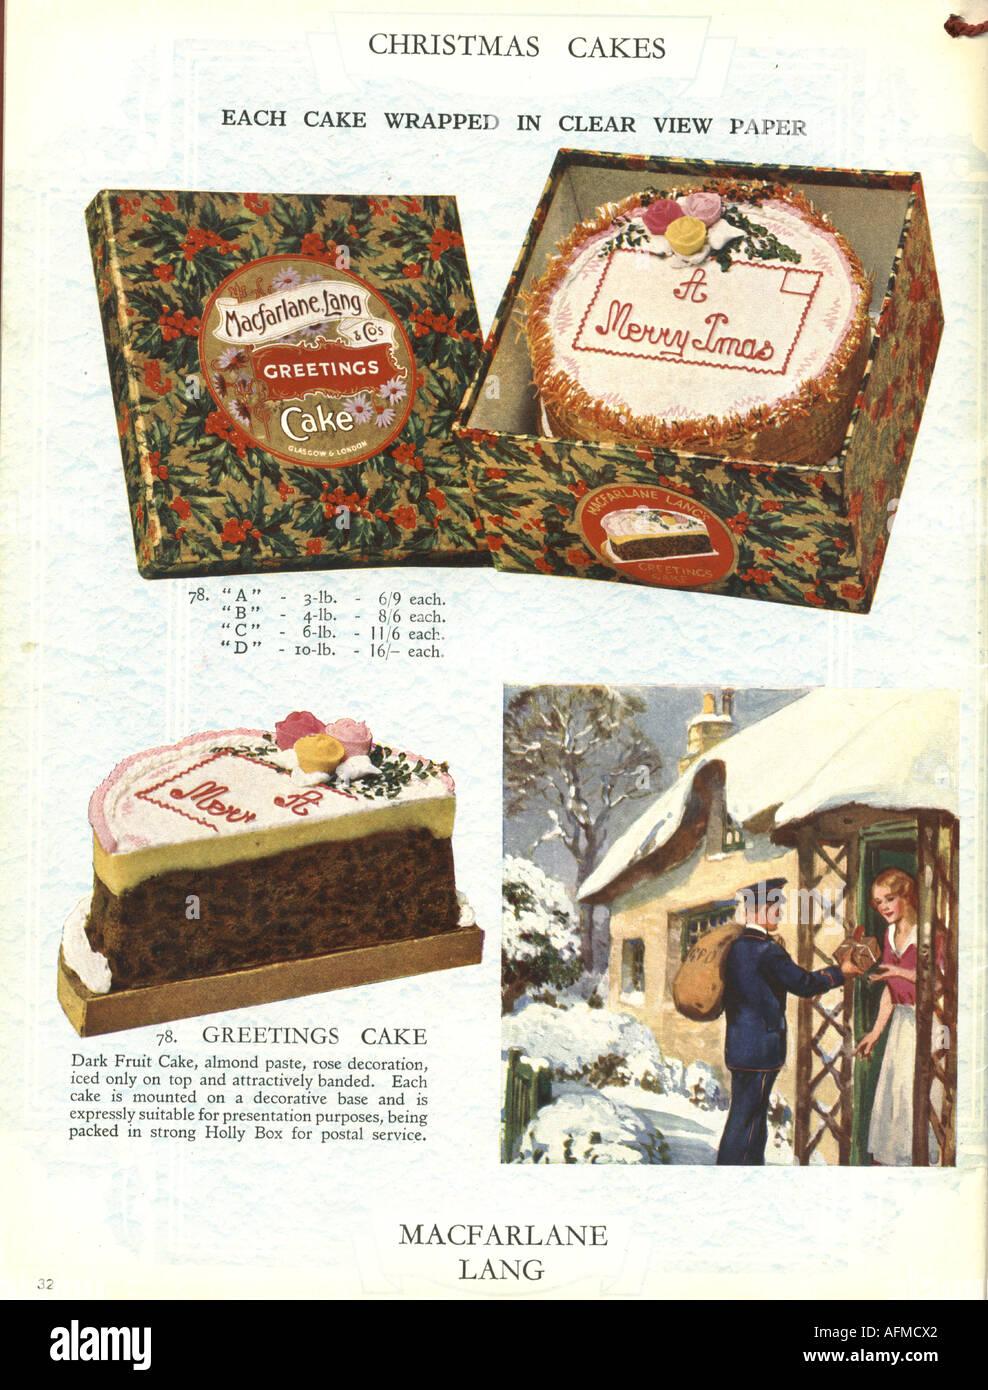 Christmas cakes from Macfarlane Lang 1934 - Stock Image